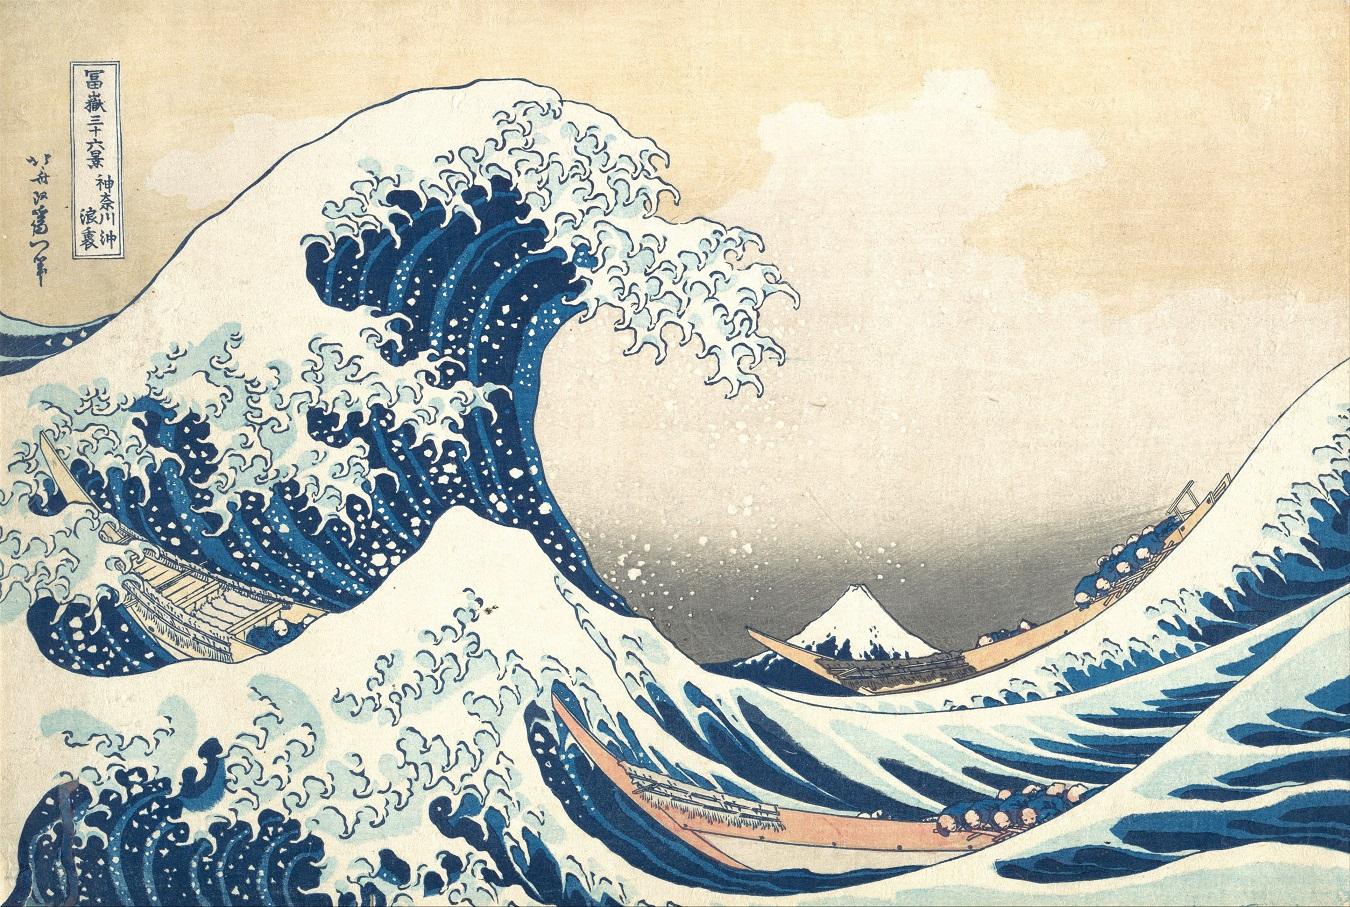 Katsushika Hokusai – Il maestro dell'ukiyoe in mostra a Milano